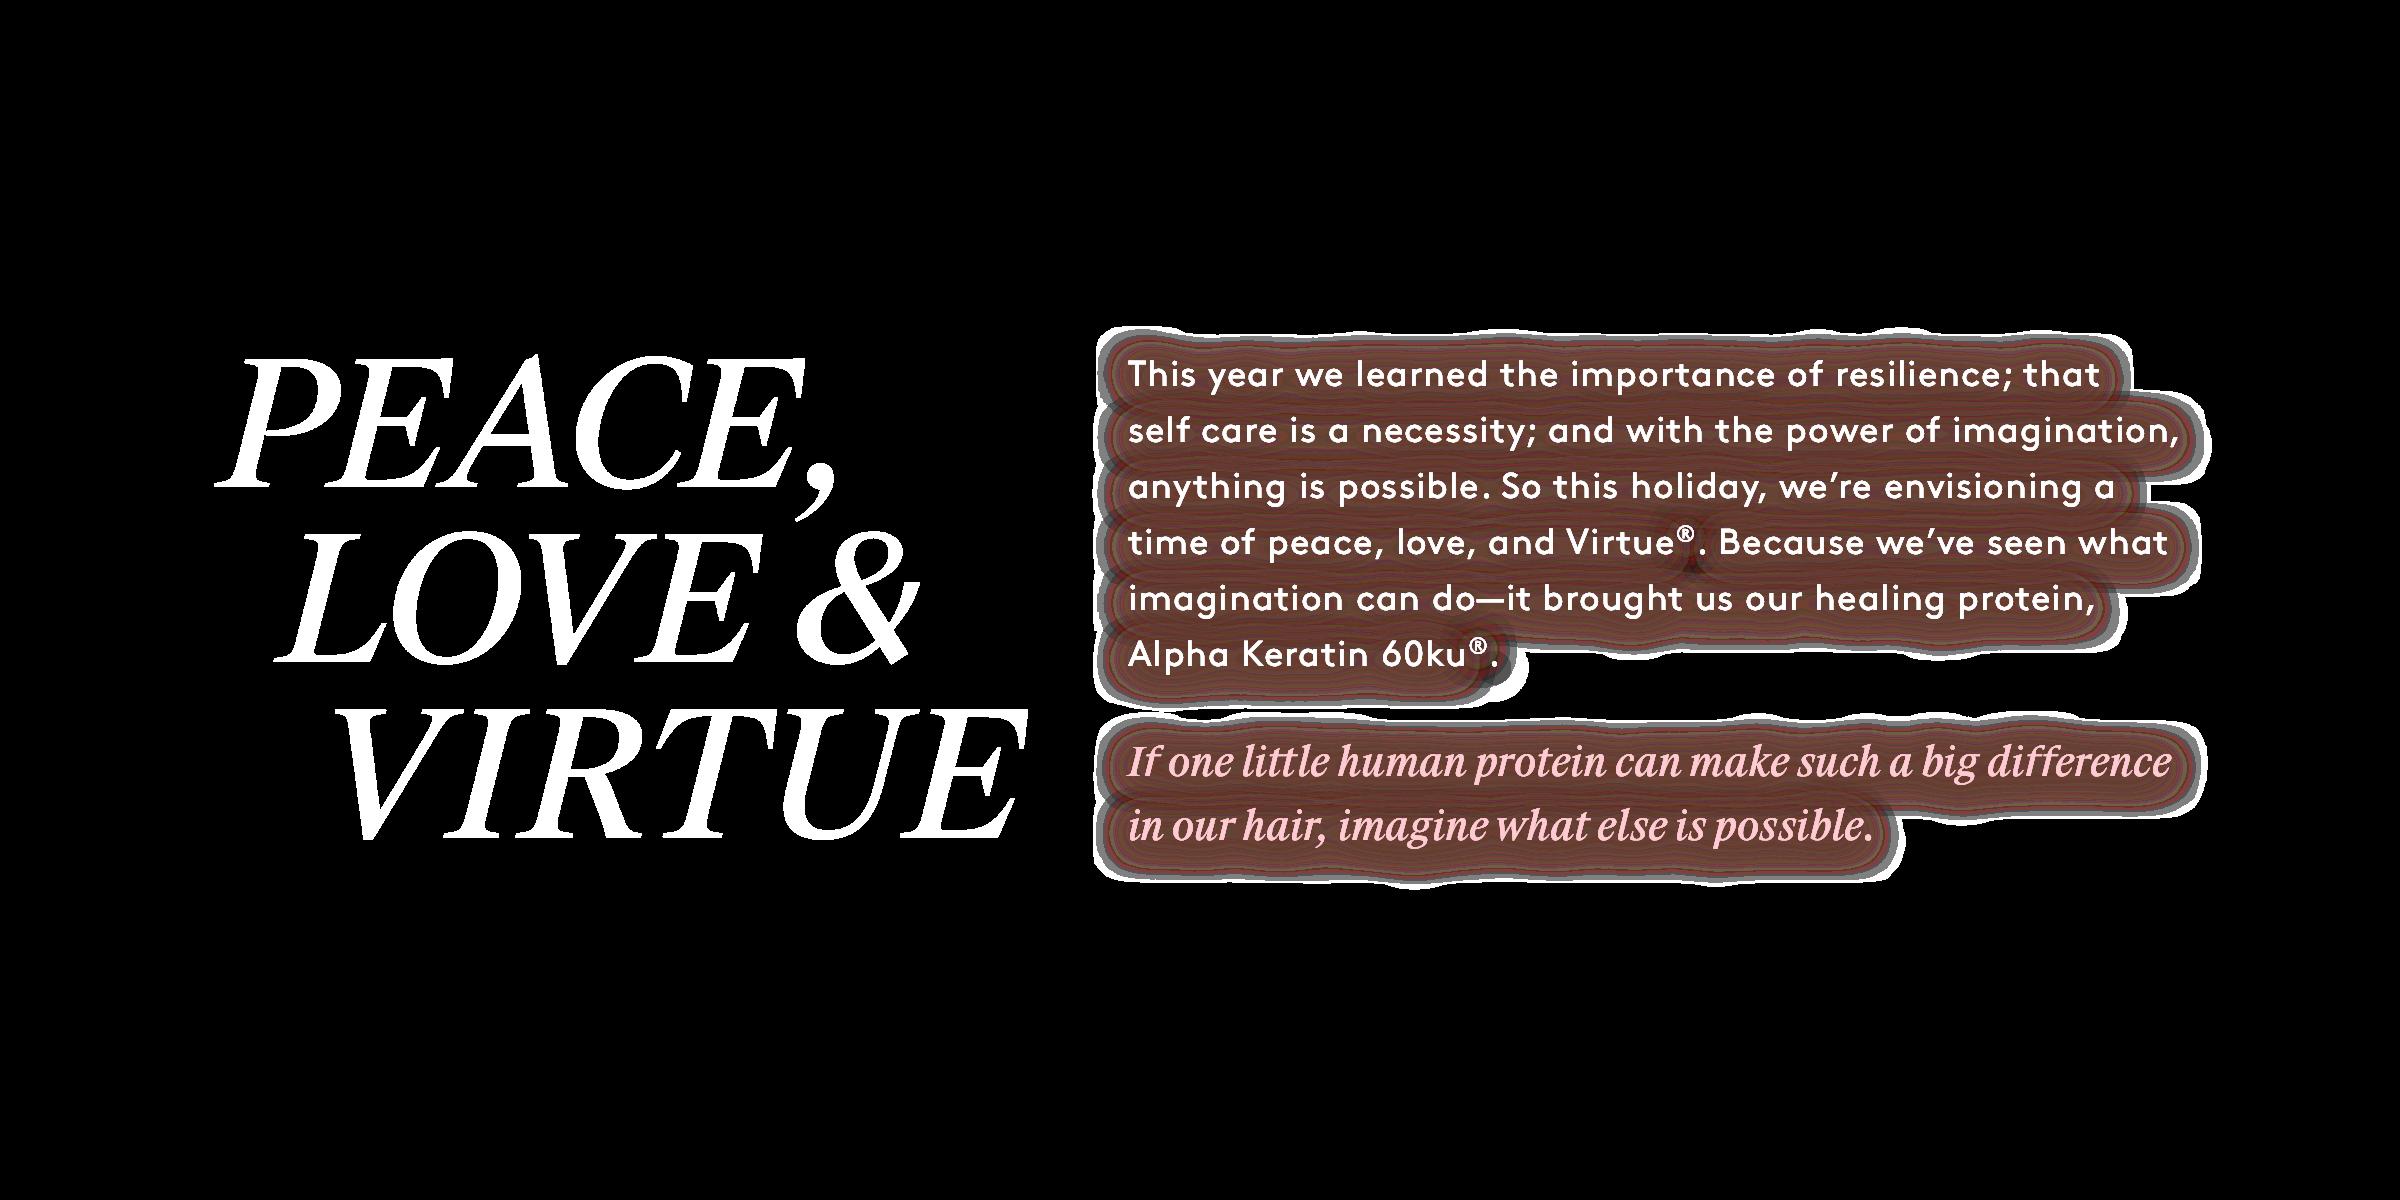 Peace, Love & Virtue